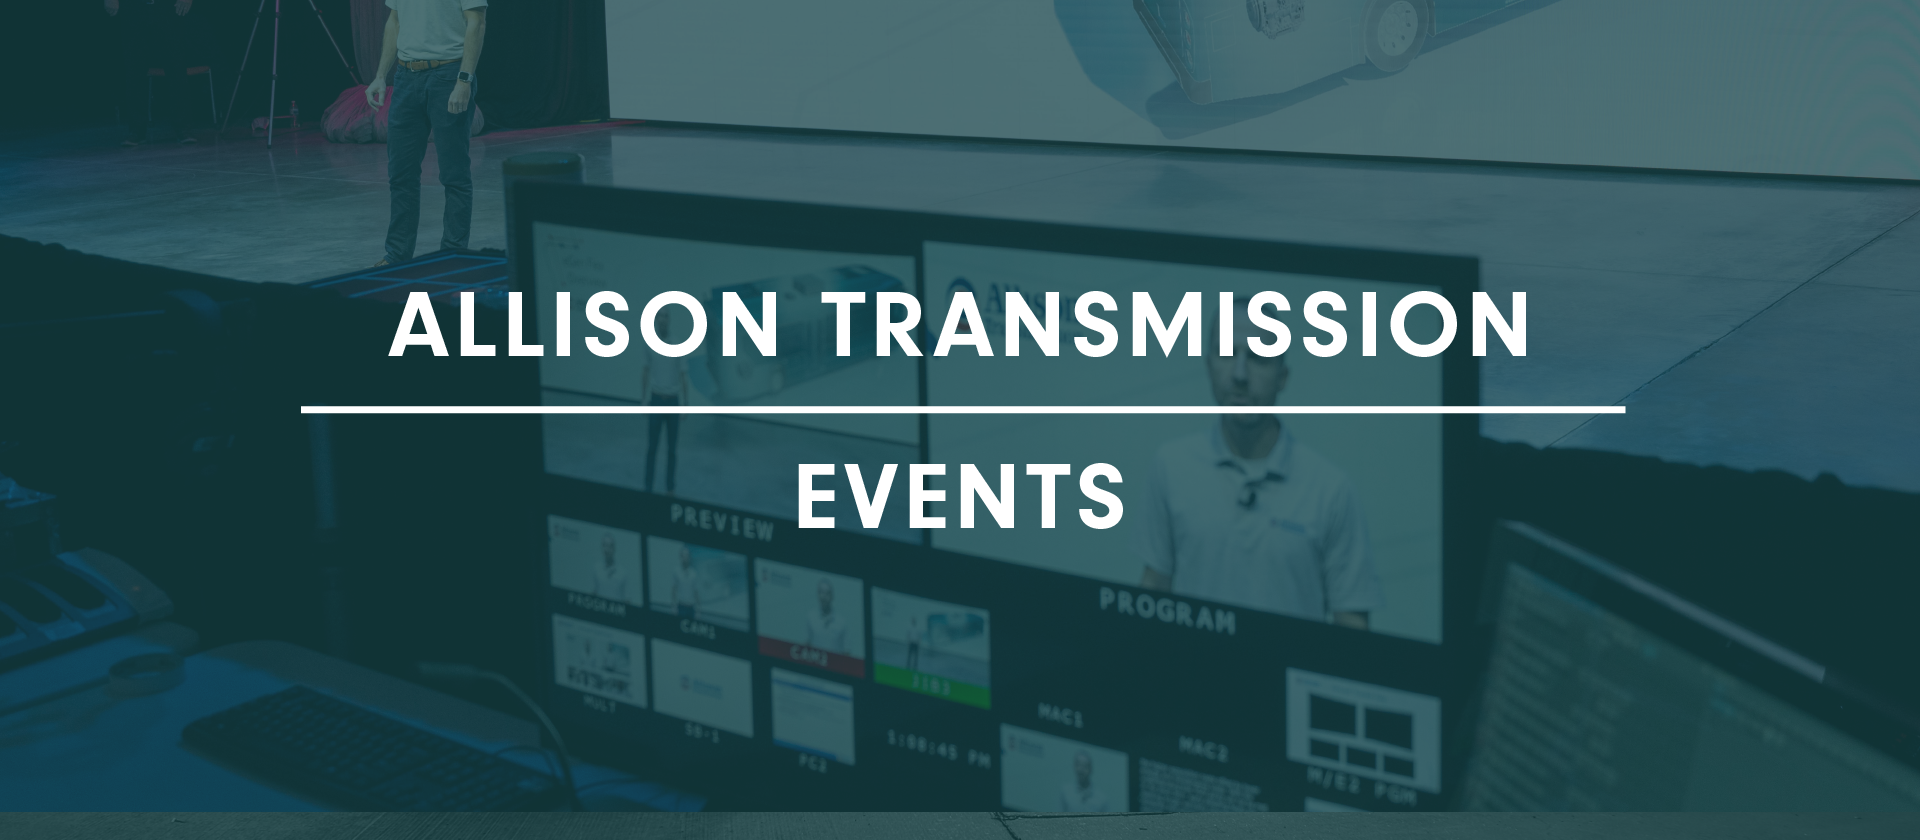 1221 AT Case Study Header 01 1 Virtual Event: Allison Transmission